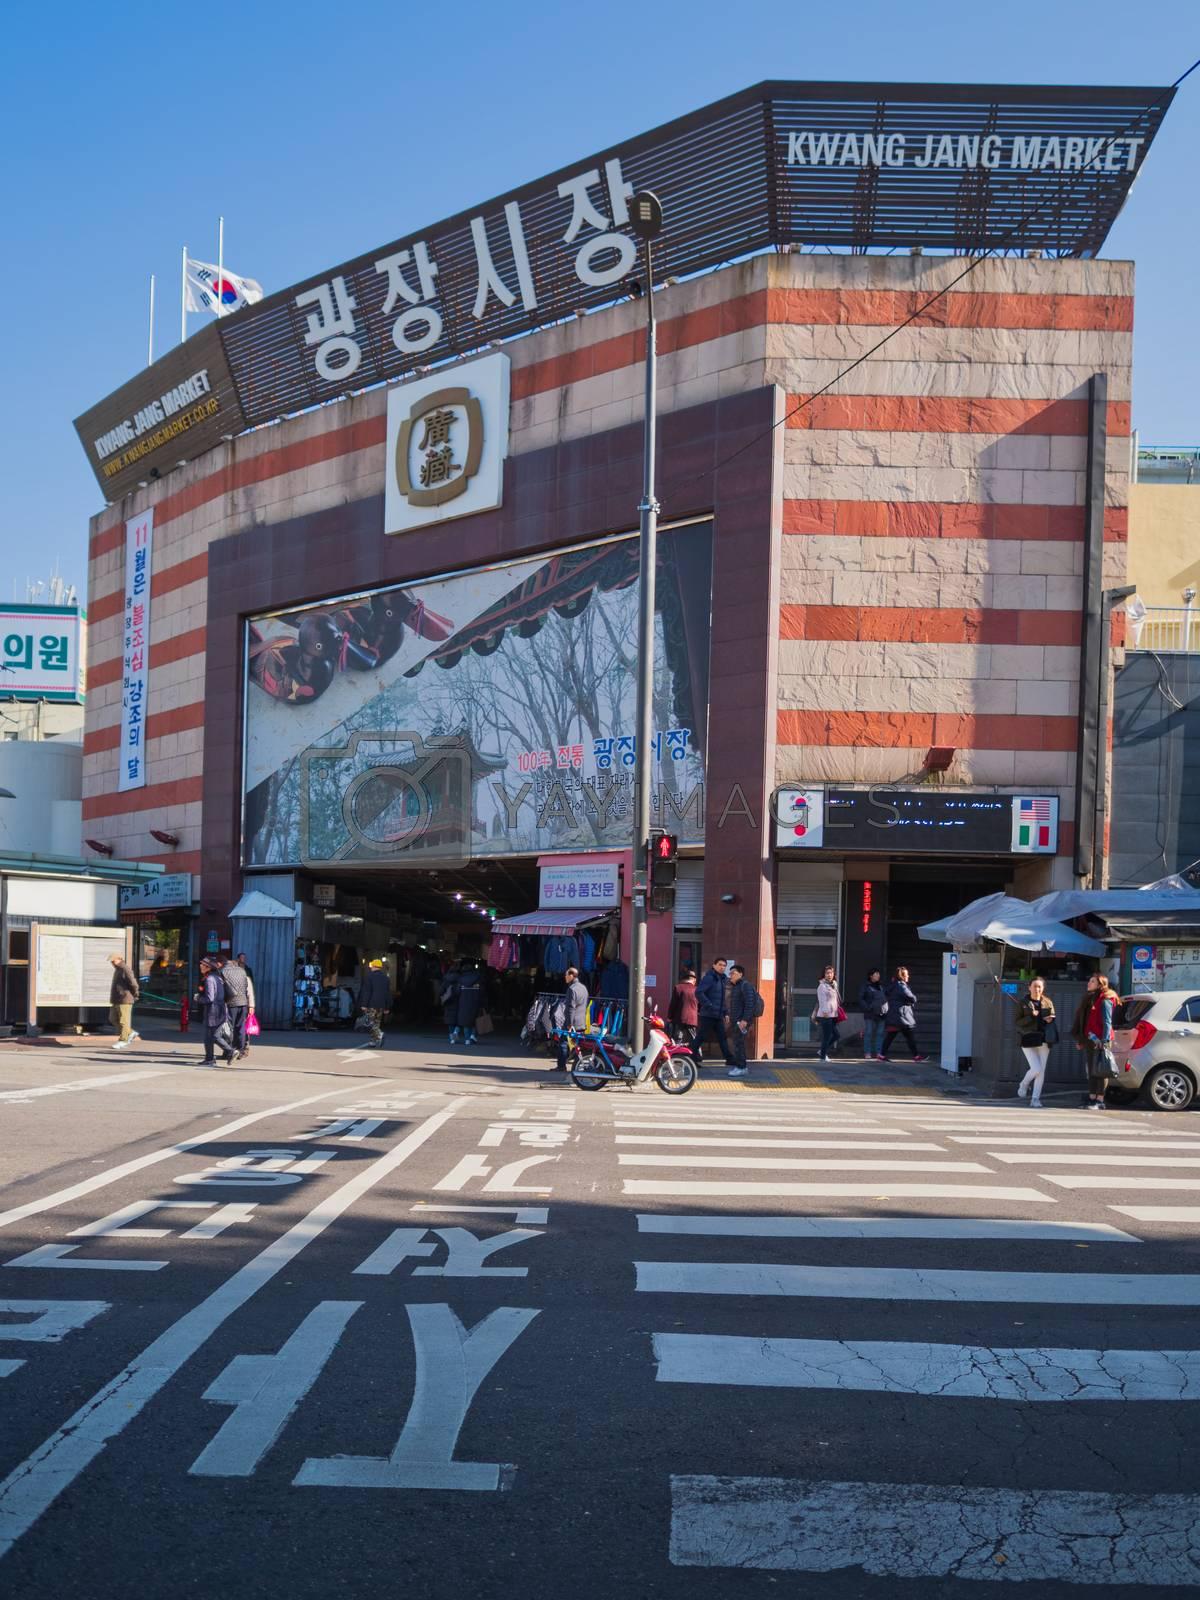 seoul, south korea - 11th november 2017: popular gwangjang traditional market in seoul